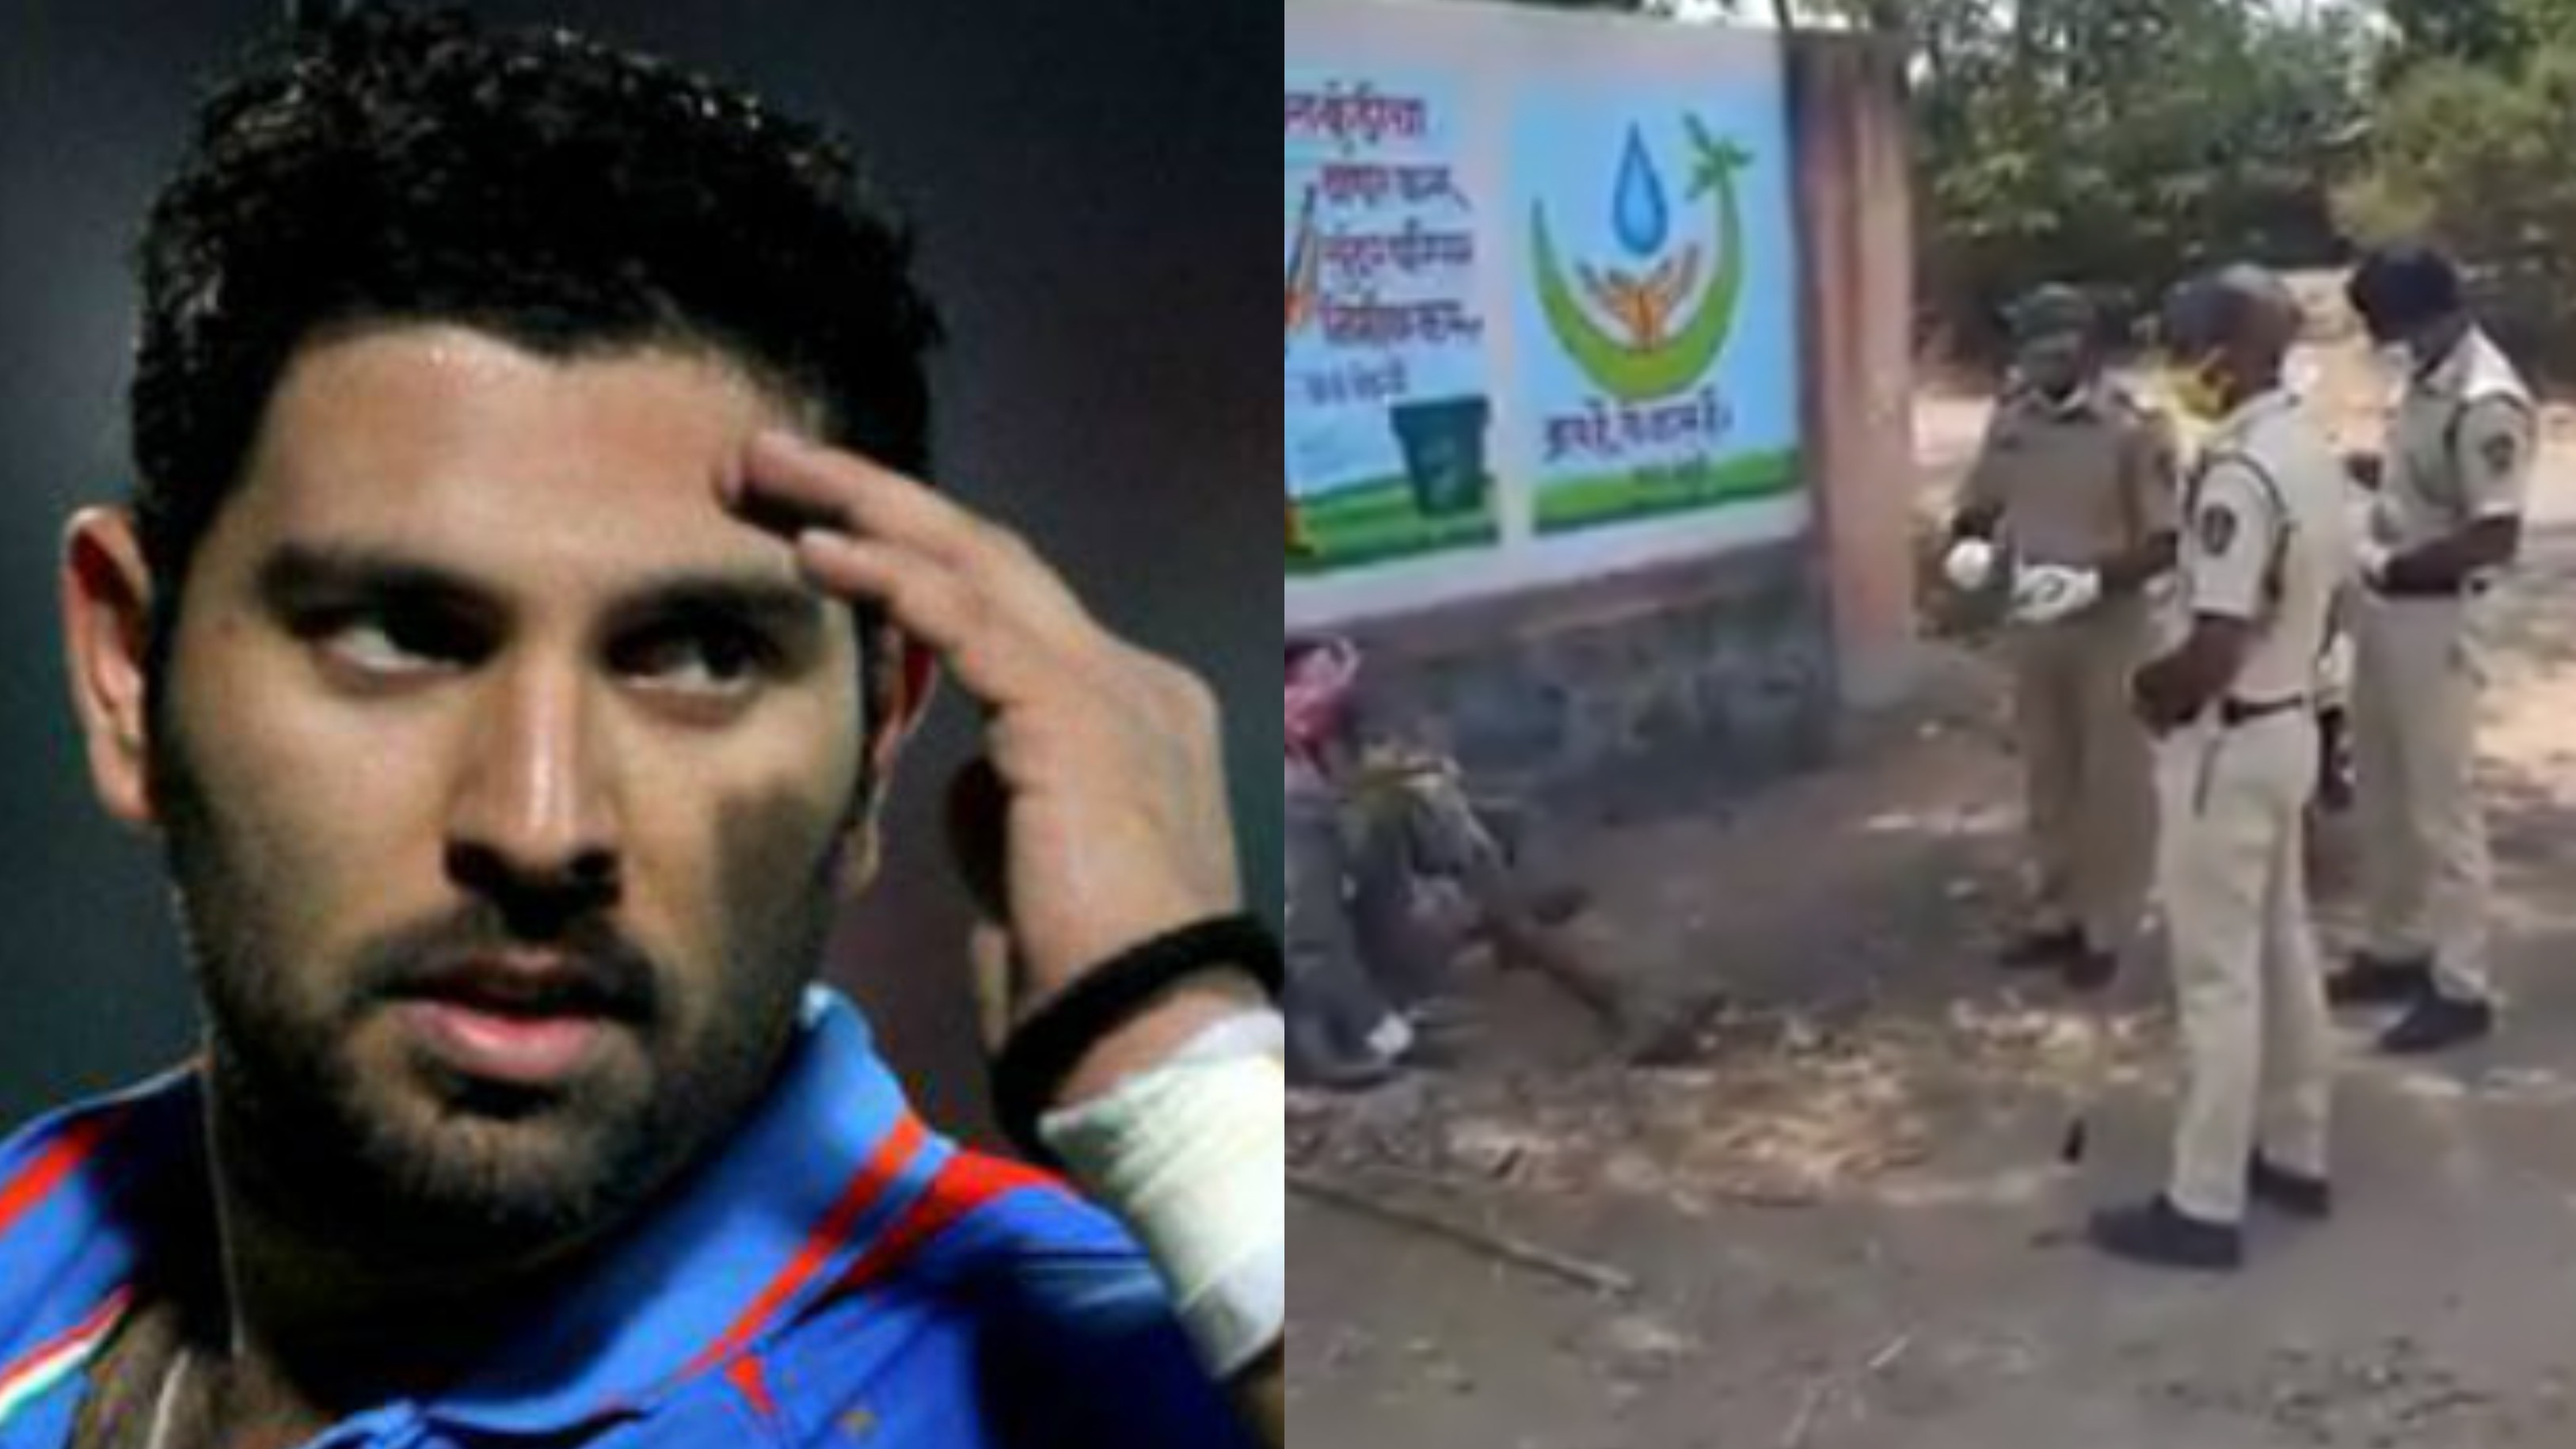 Yuvraj Singh applauds policemen for their heartwarming gesture amid COVID-19 lockdown